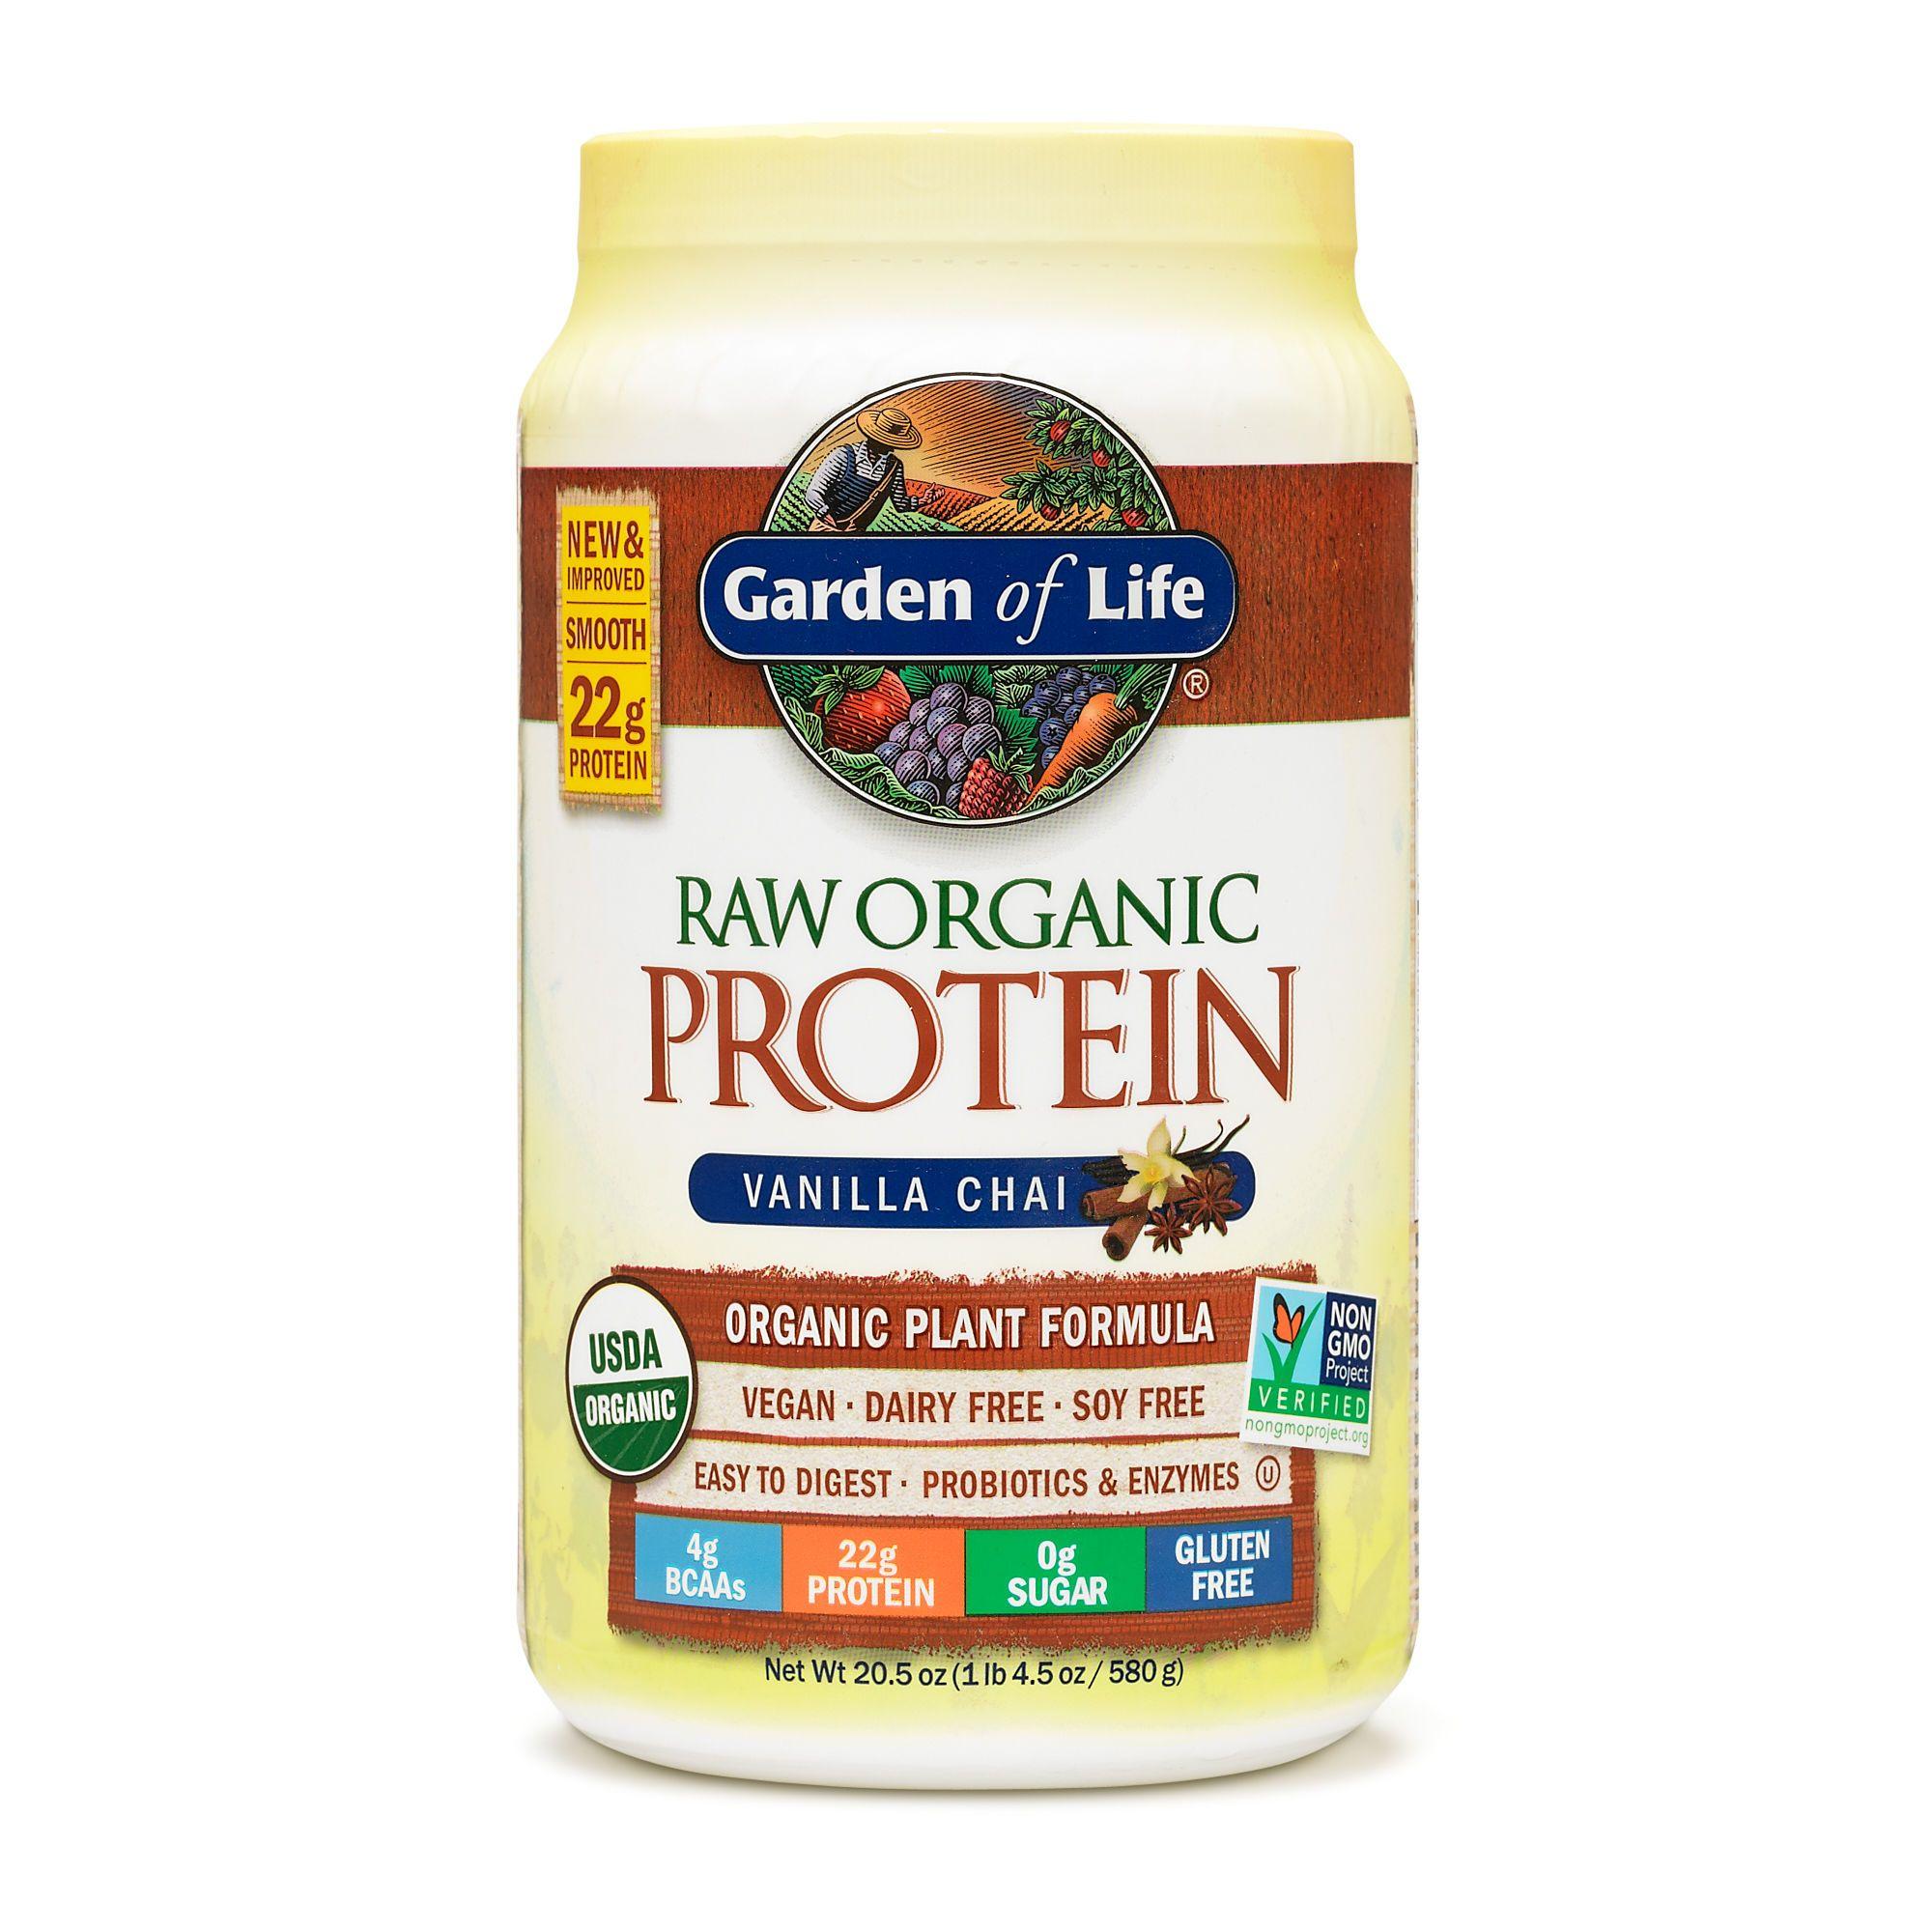 Garden of Life® Raw Organic Protein Organic protein